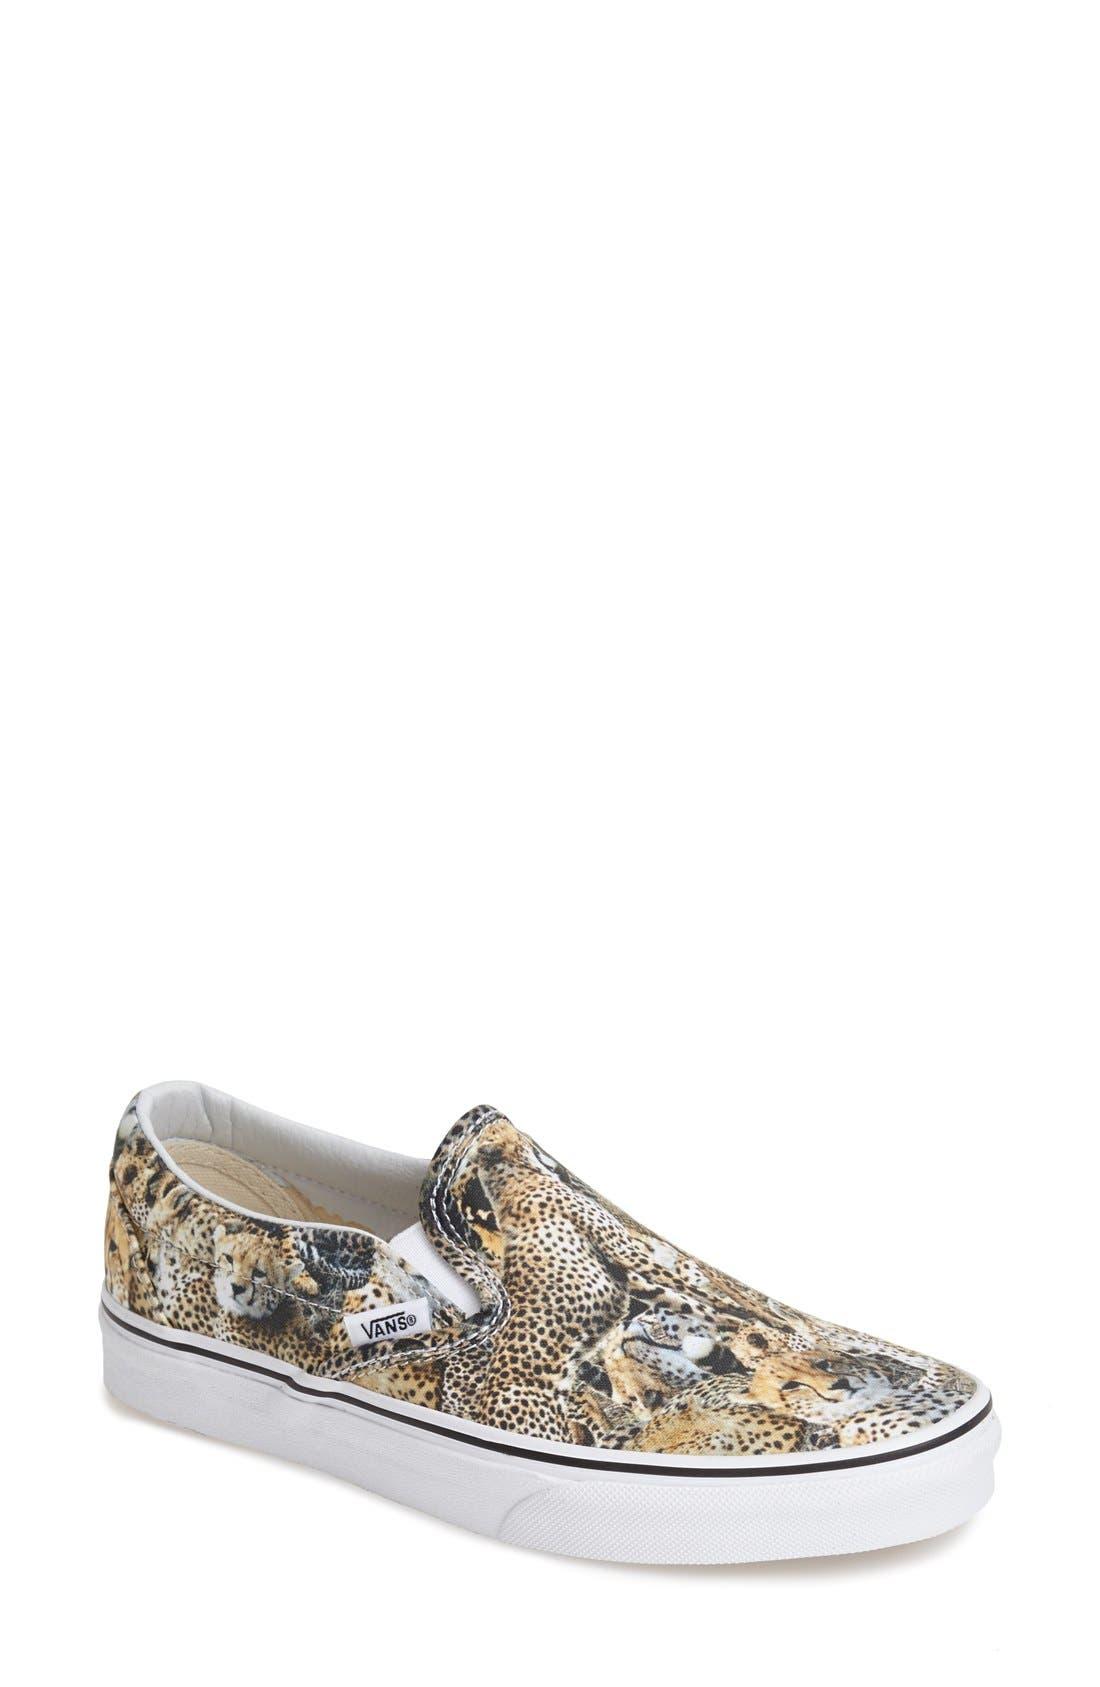 Main Image - Vans 'Classic - Kenya' Slip-On Sneaker (Women)